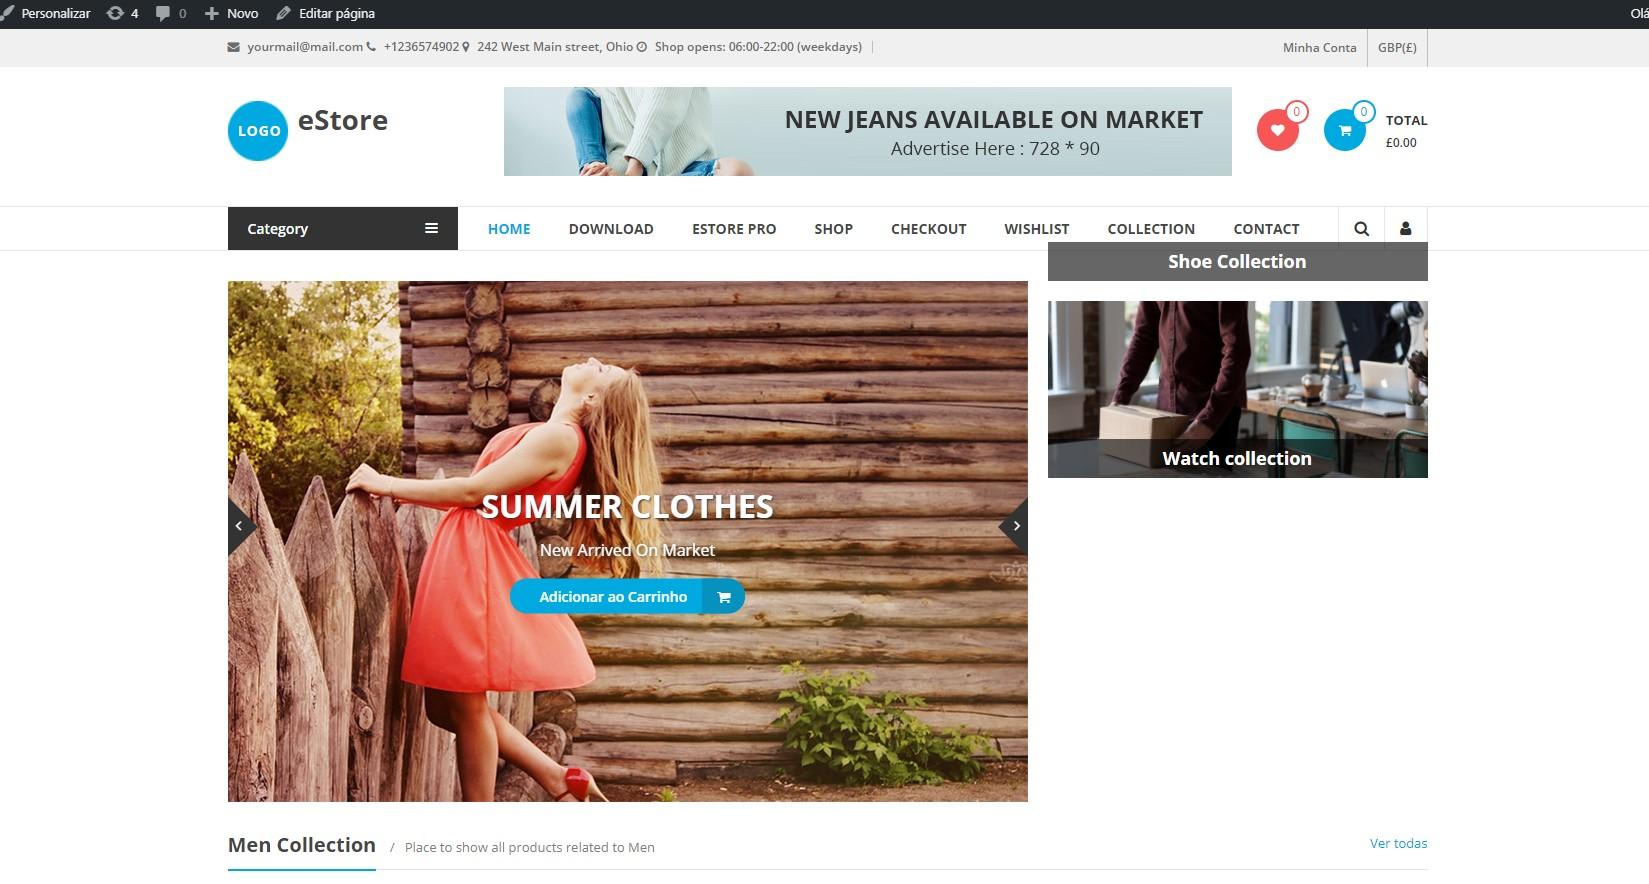 nova loja online